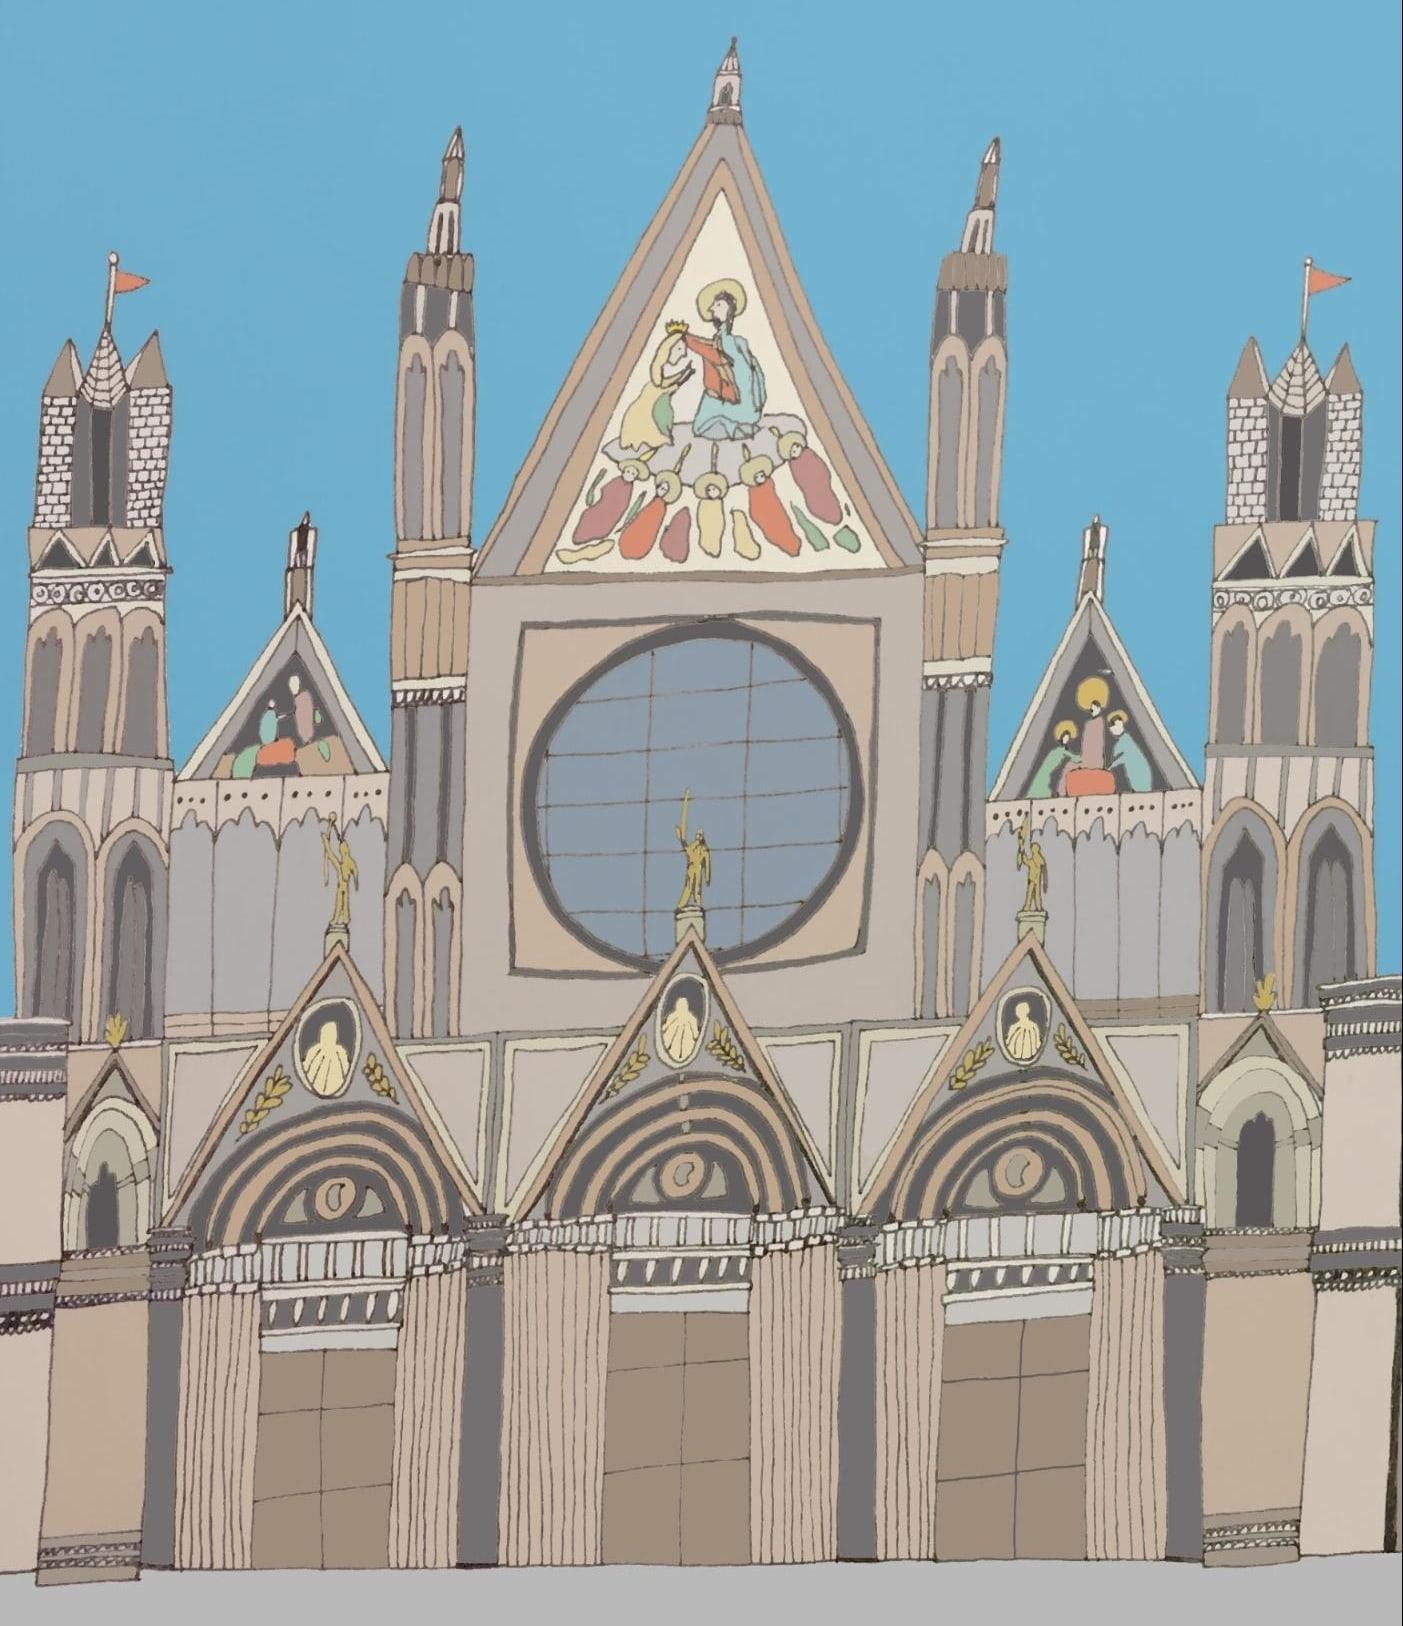 How-church-architecture-min.jpg